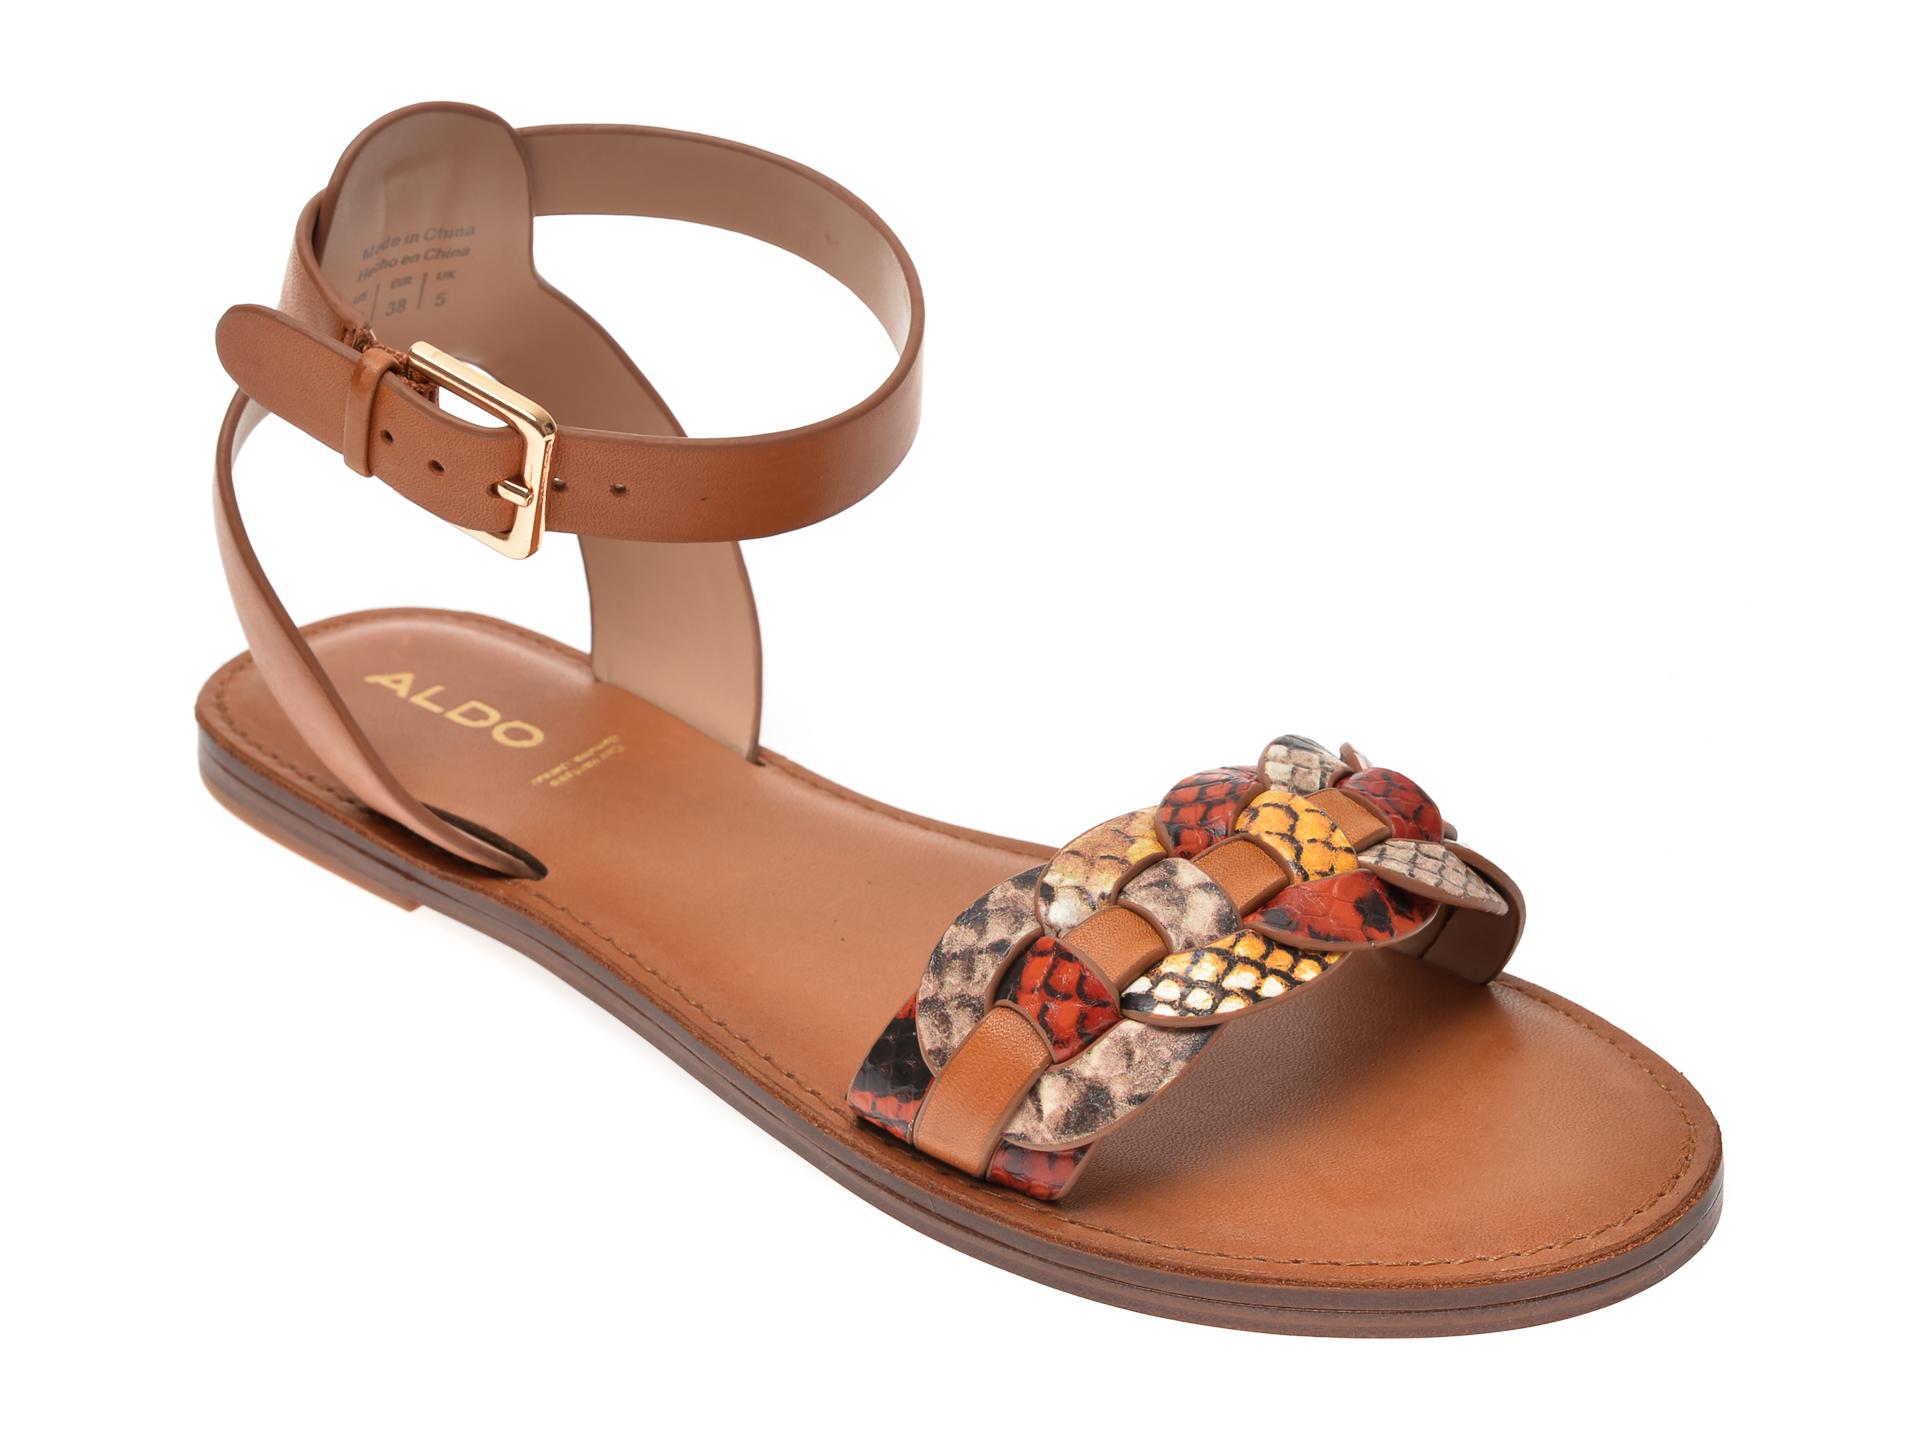 Sandale ALDO multicolor, Ligaria960, din piele naturala